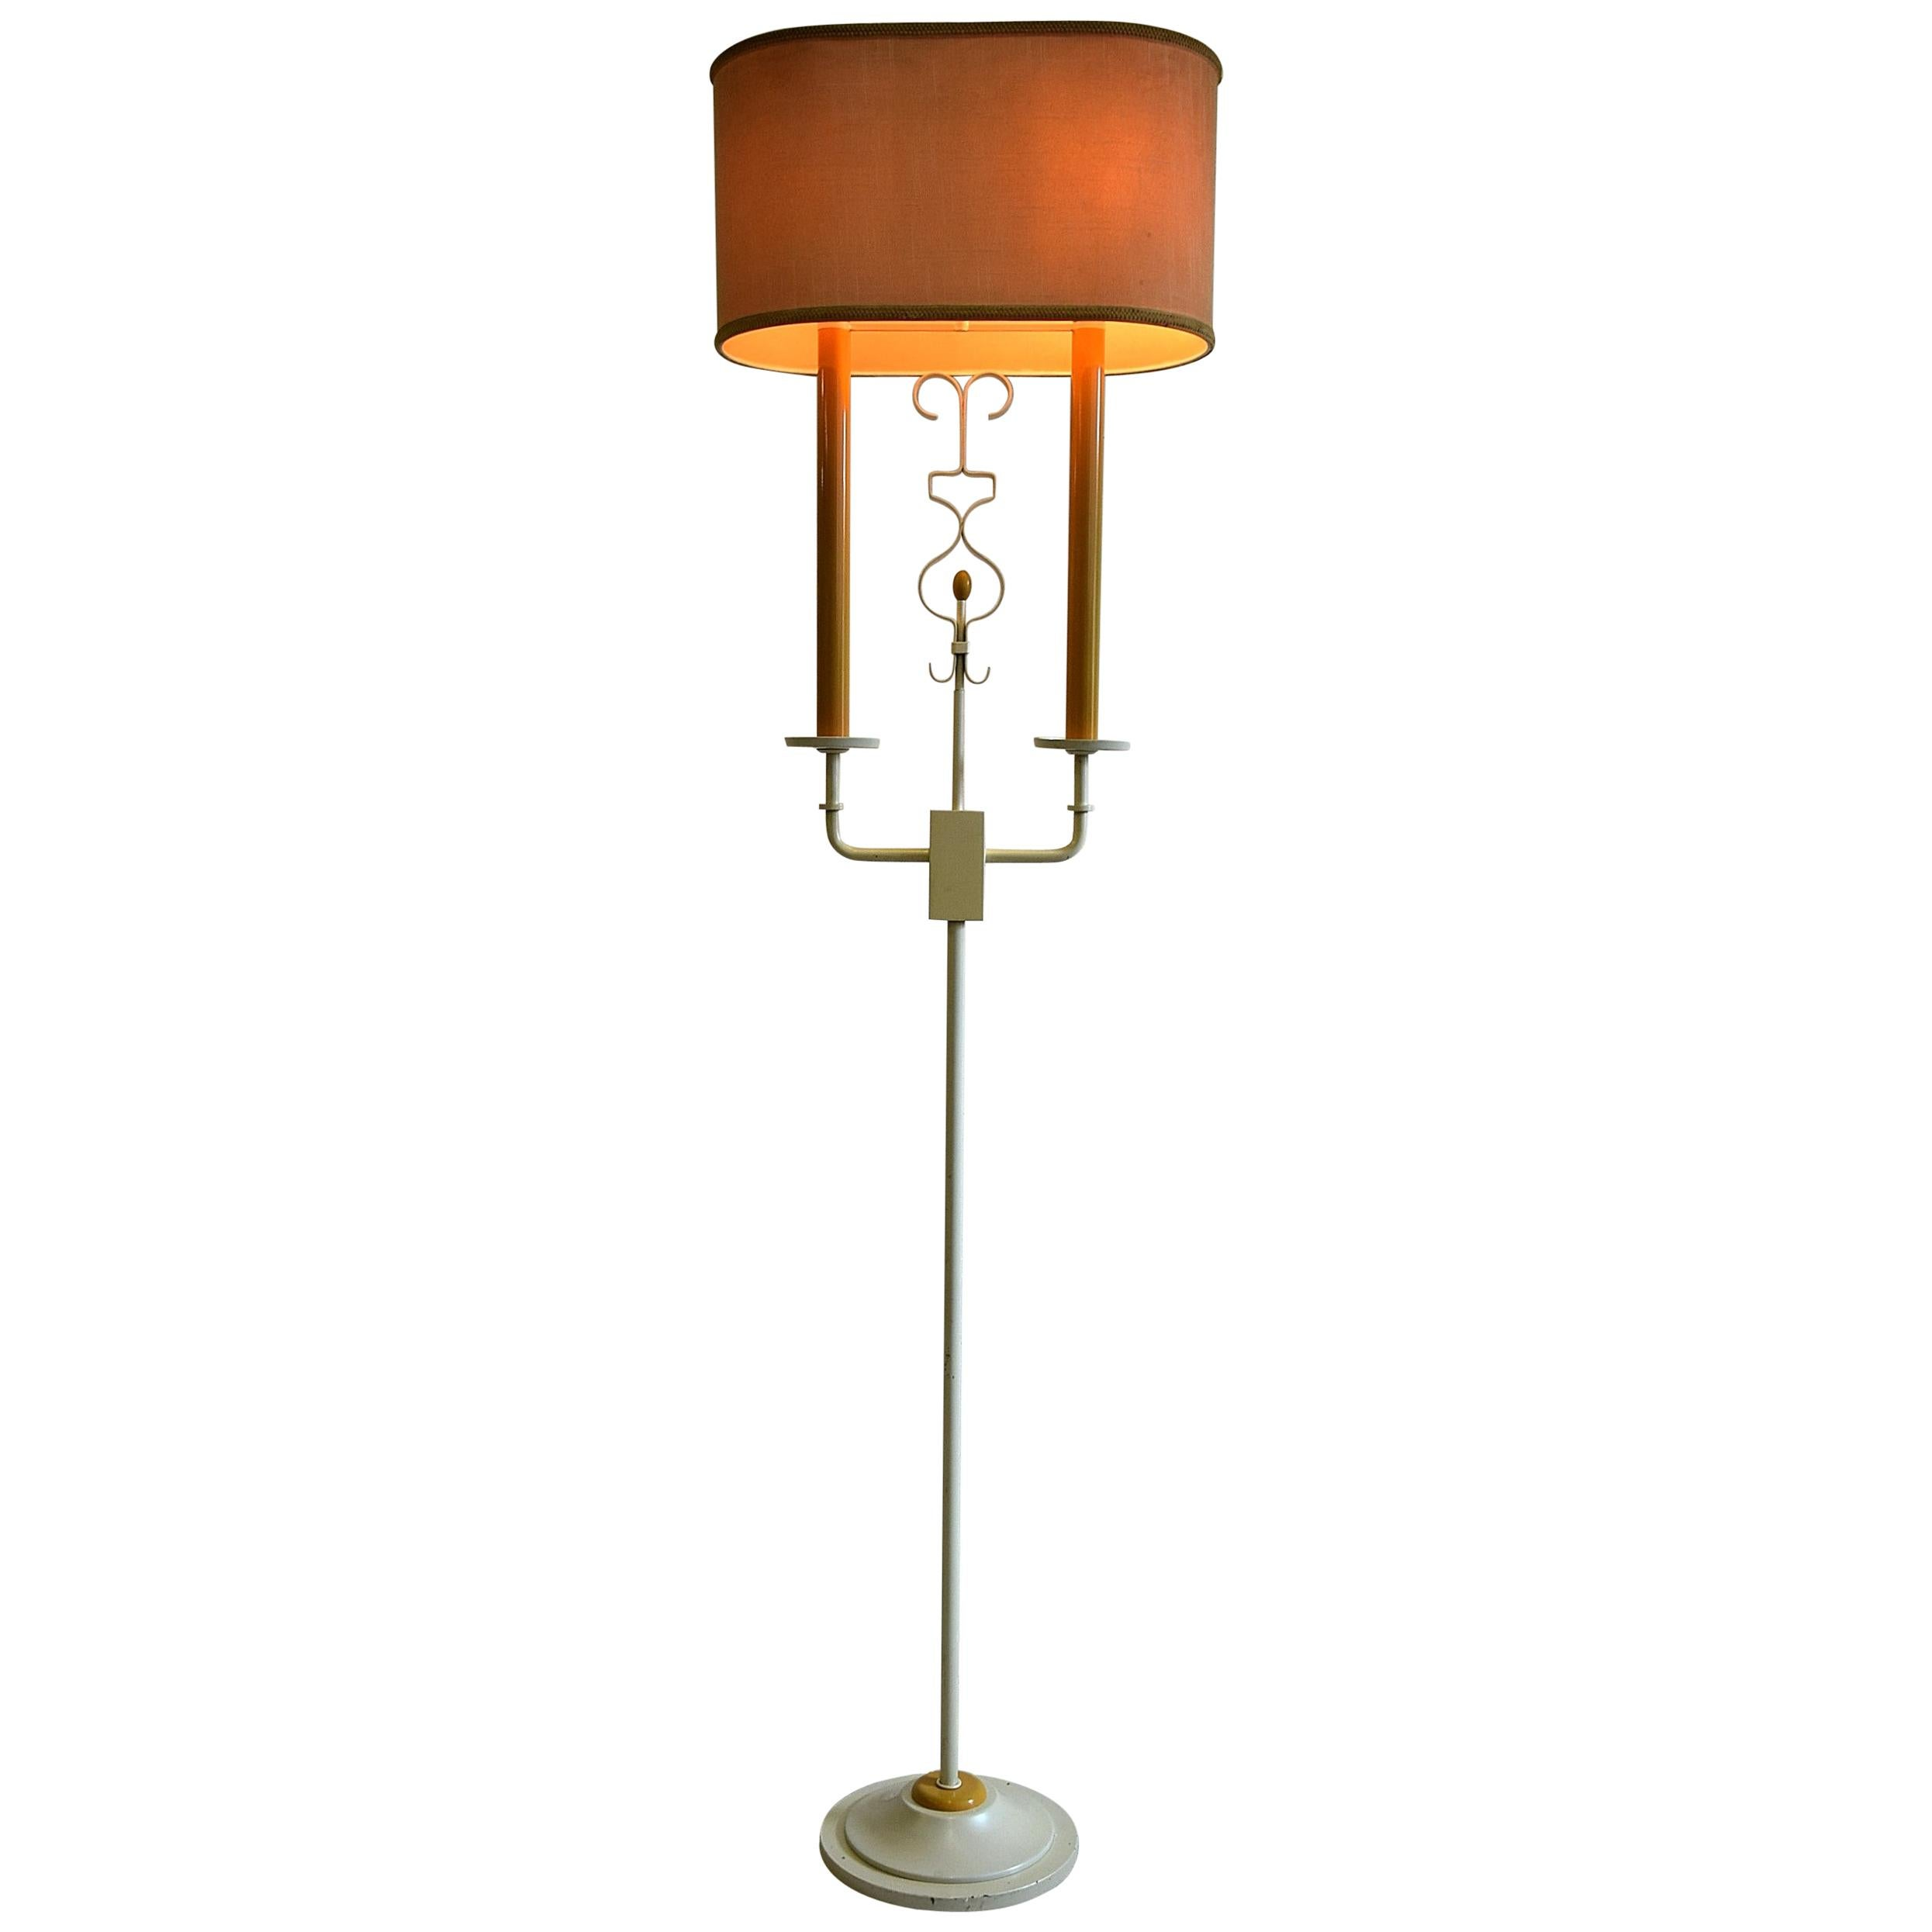 Italian Midcentury Floor Lamp by Stilnovo, 1960s